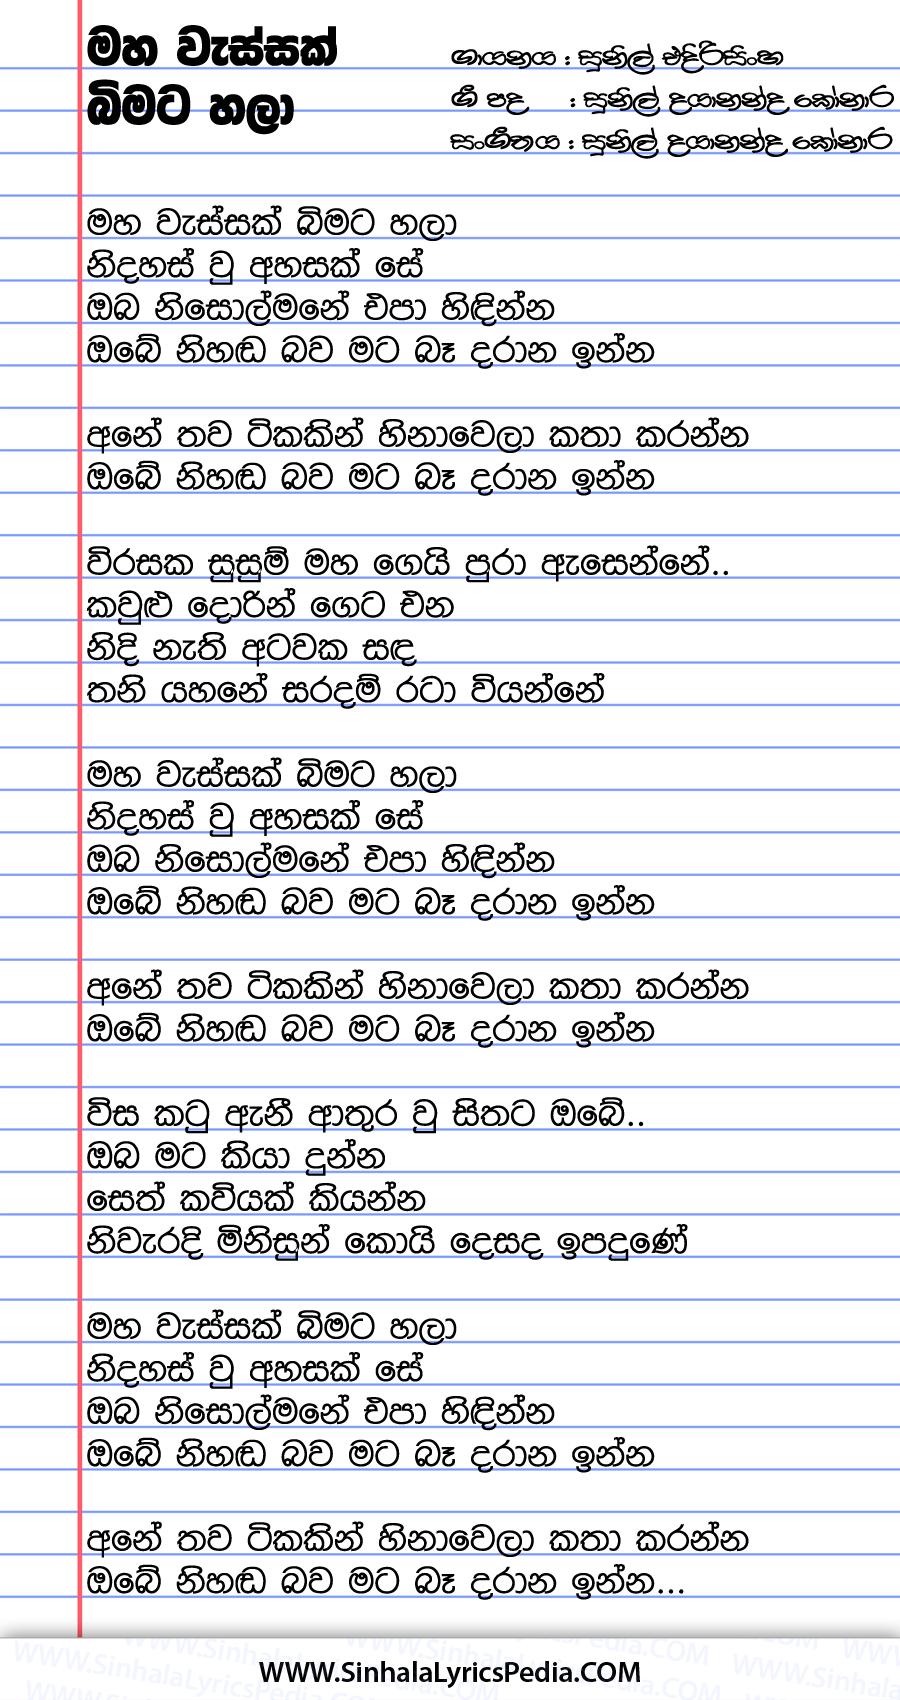 Maha Wassak Bimata Hela Song Lyrics